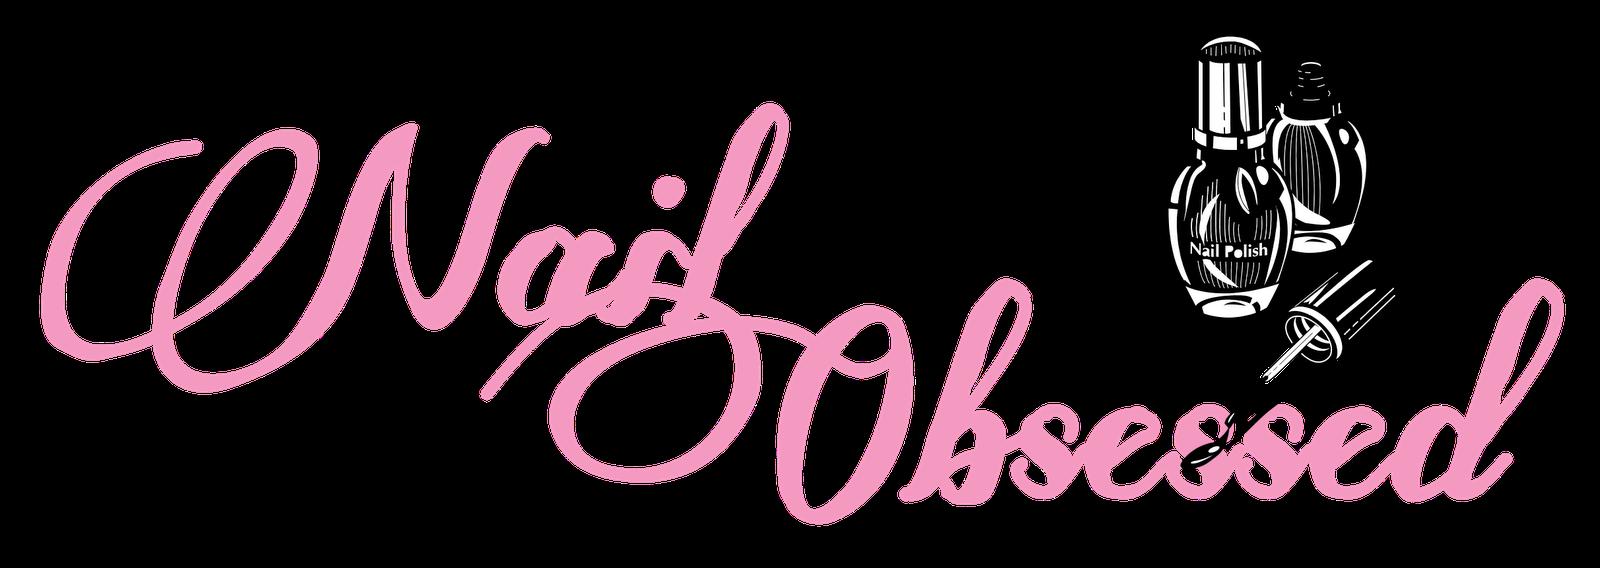 Art Nail Salon Logo Uñas